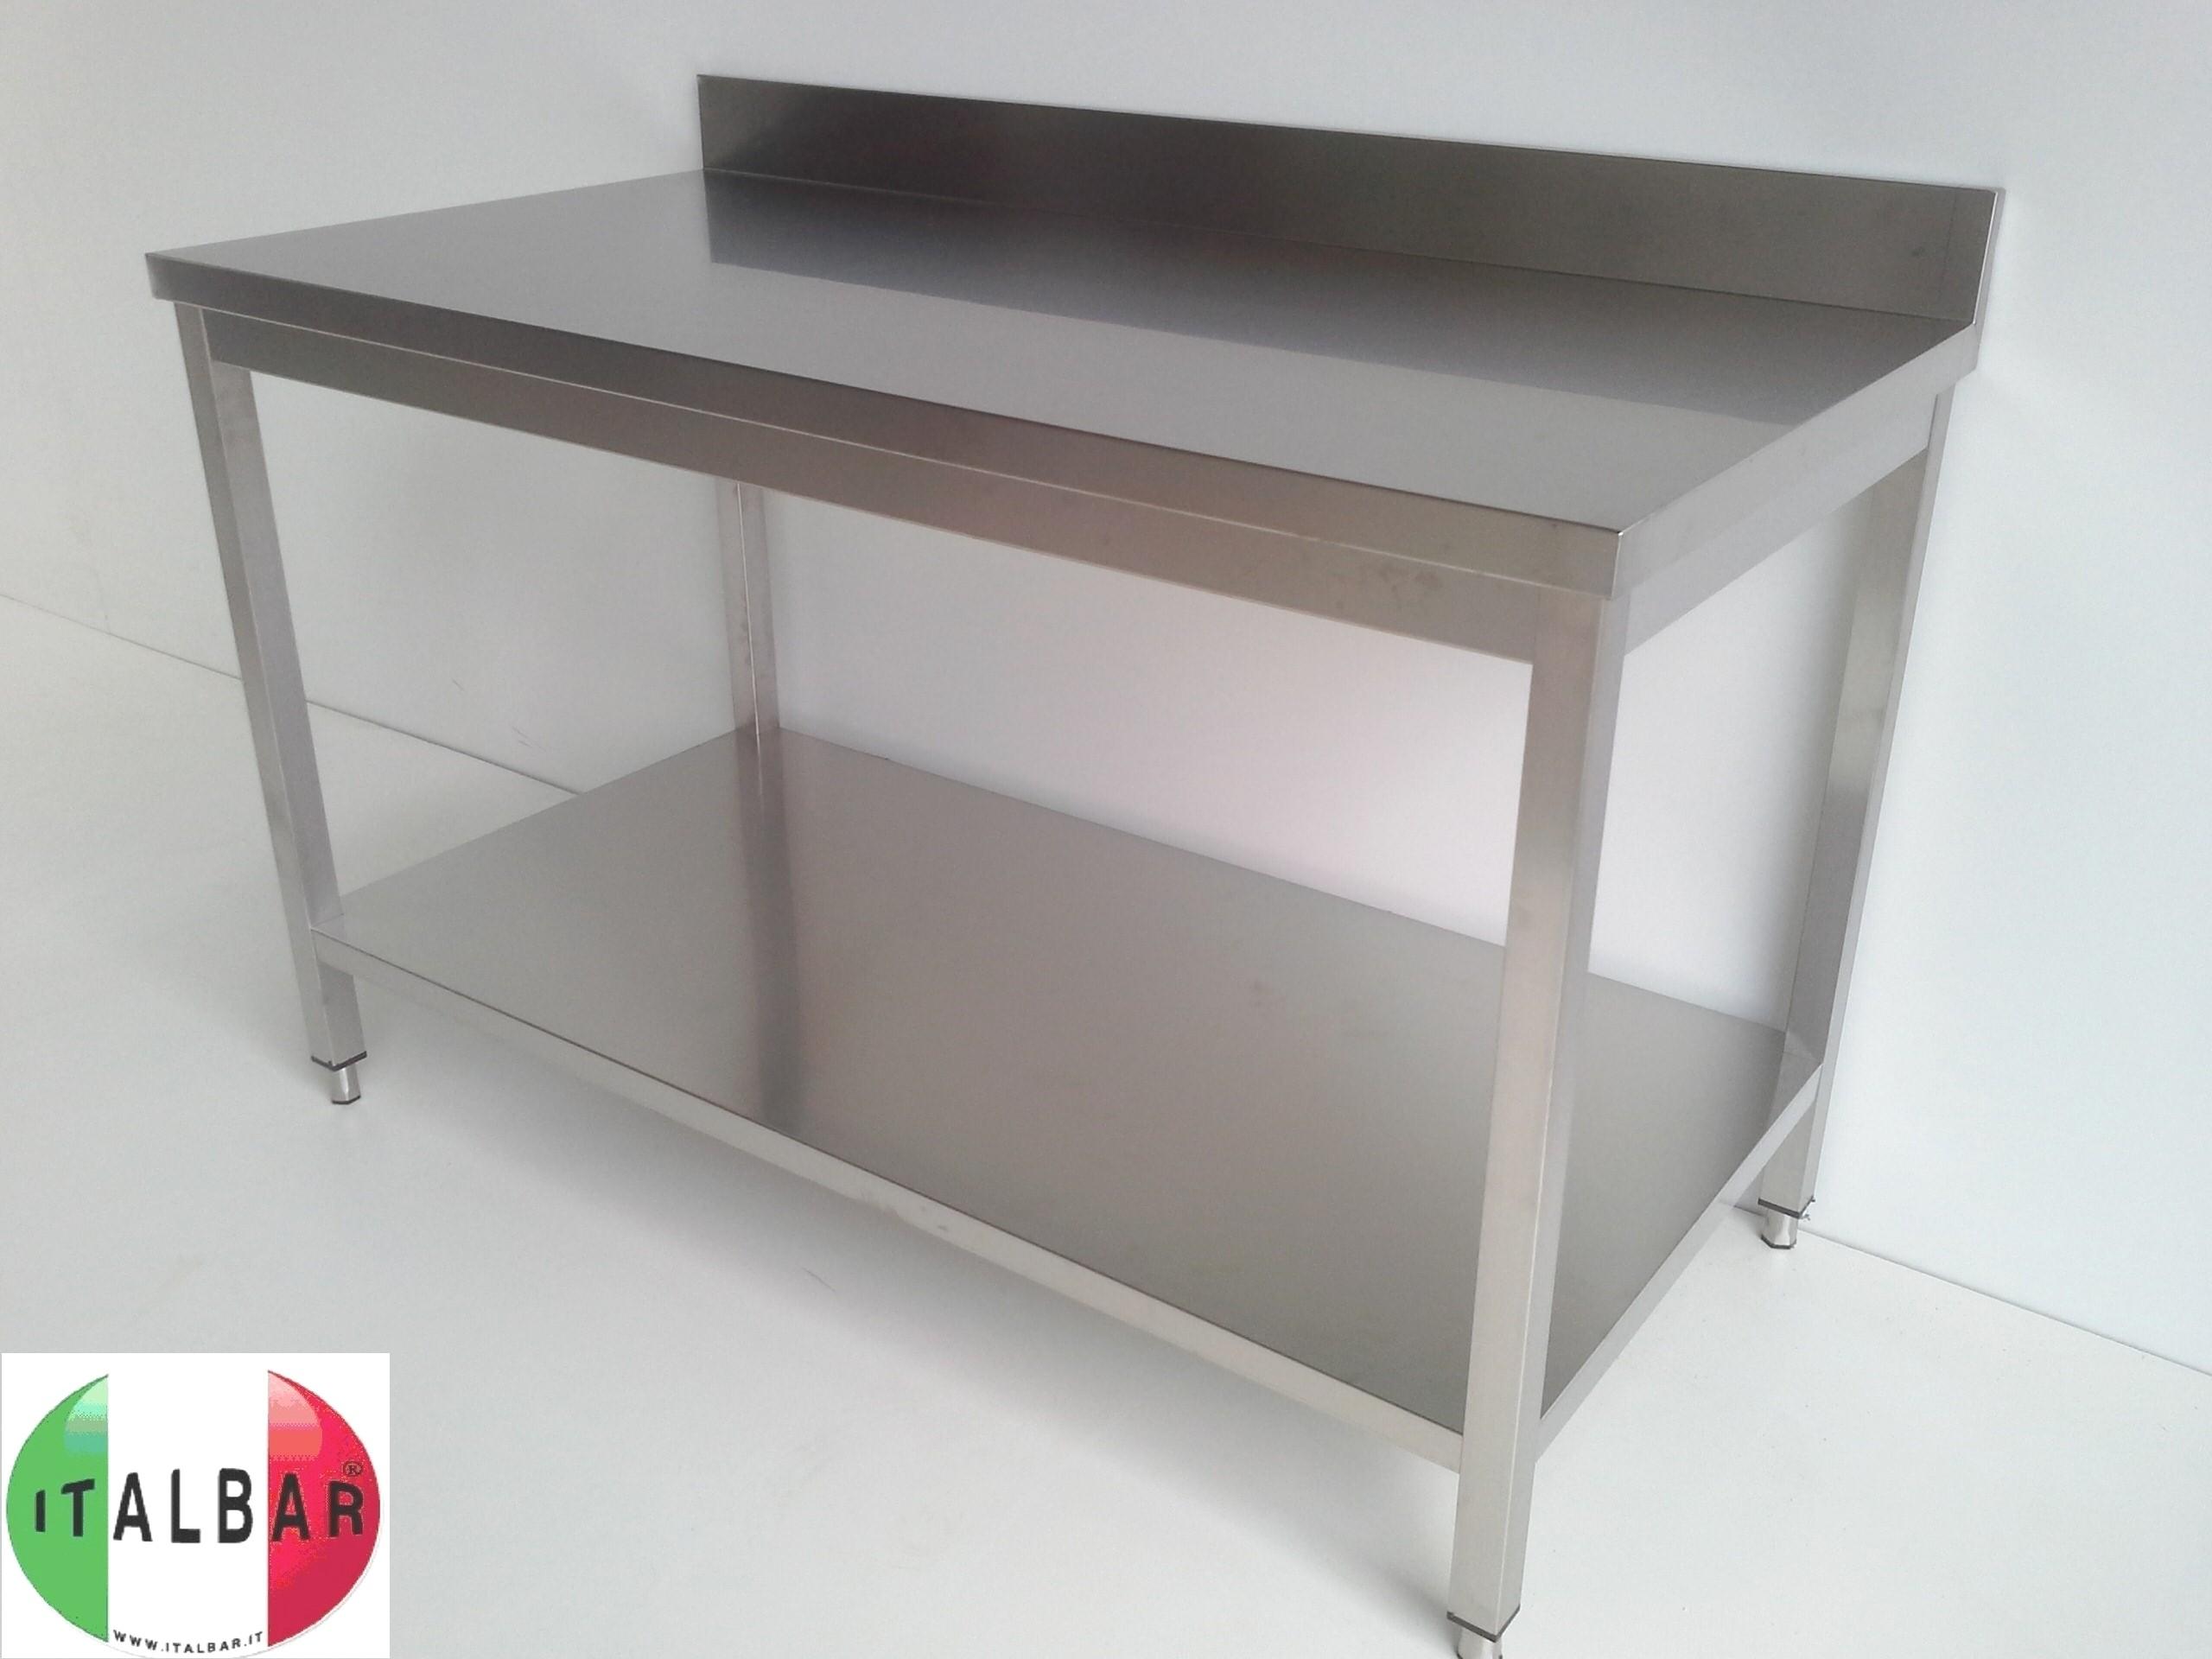 Italbar banconi bar banchi frigo vetrine refrigerate tavolo inox con ripiano cm - Tavolo acciaio inox usato ...